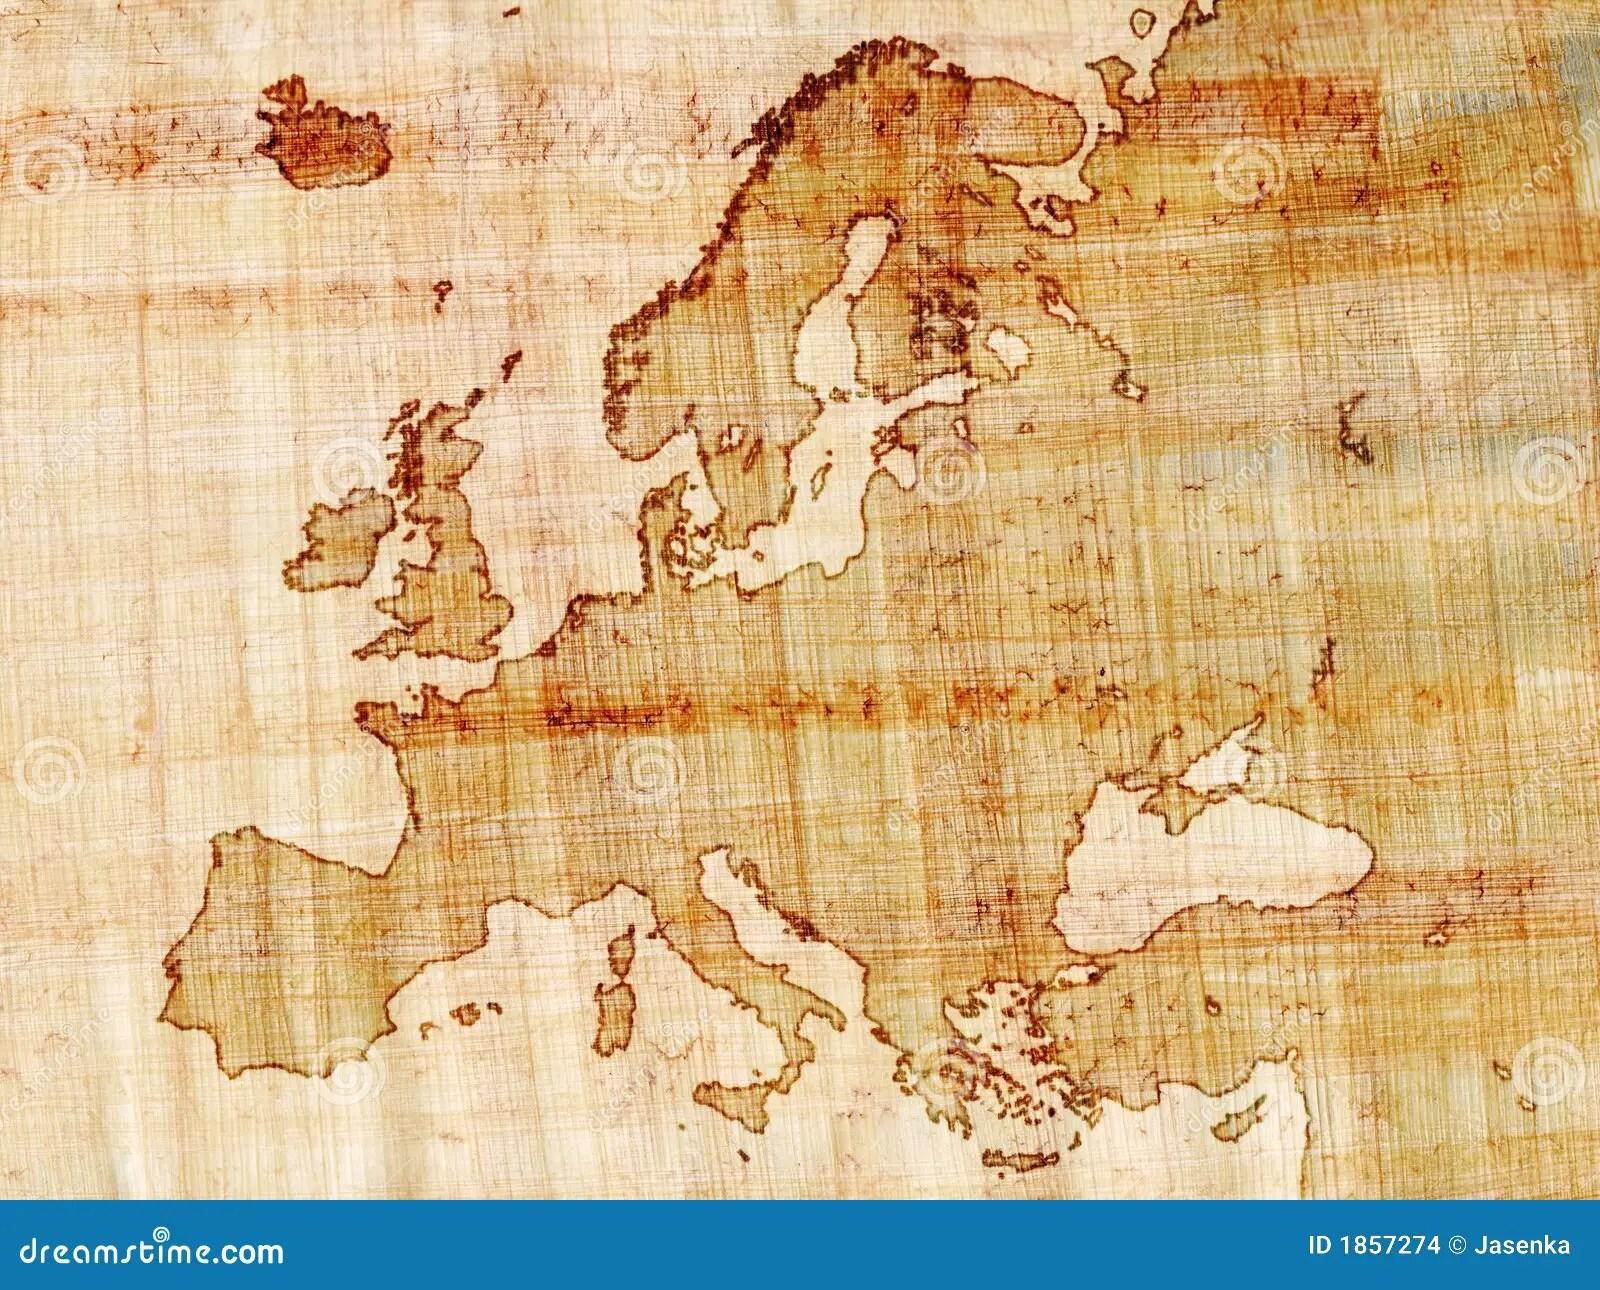 China Beautiful Girl Wallpaper Europe On Papyrus Stock Images Image 1857274